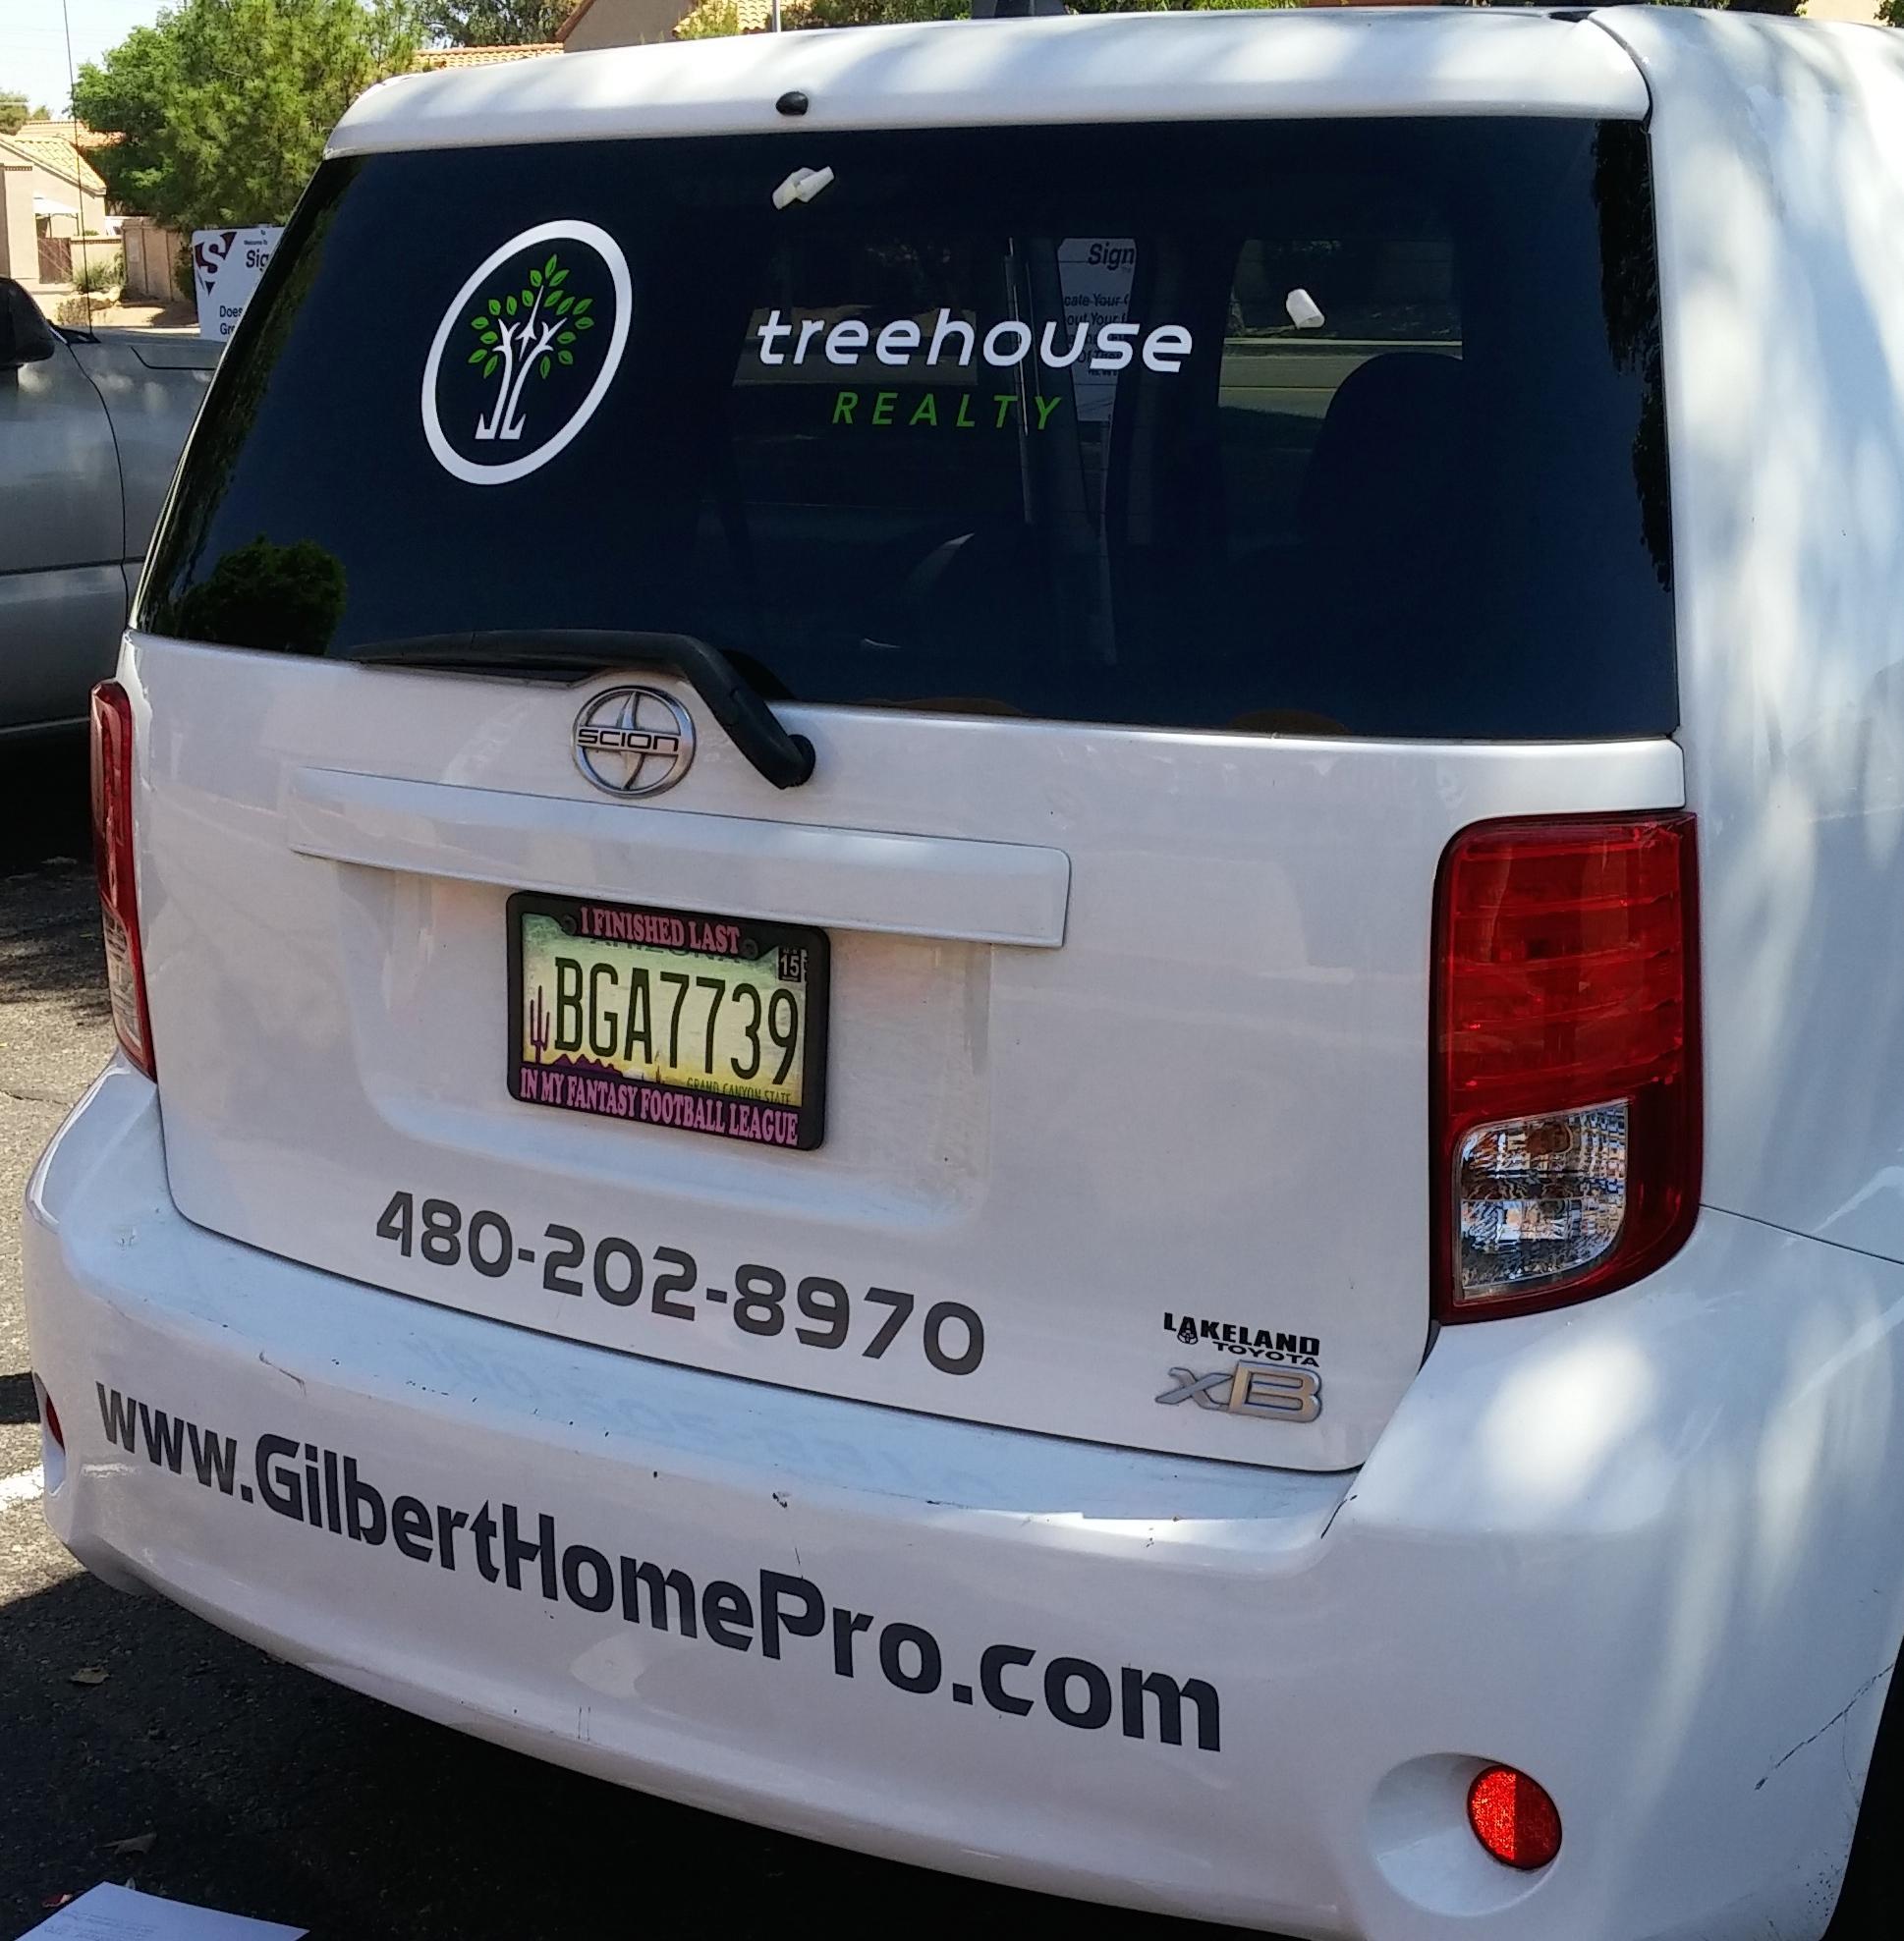 Gilbert Home Pros